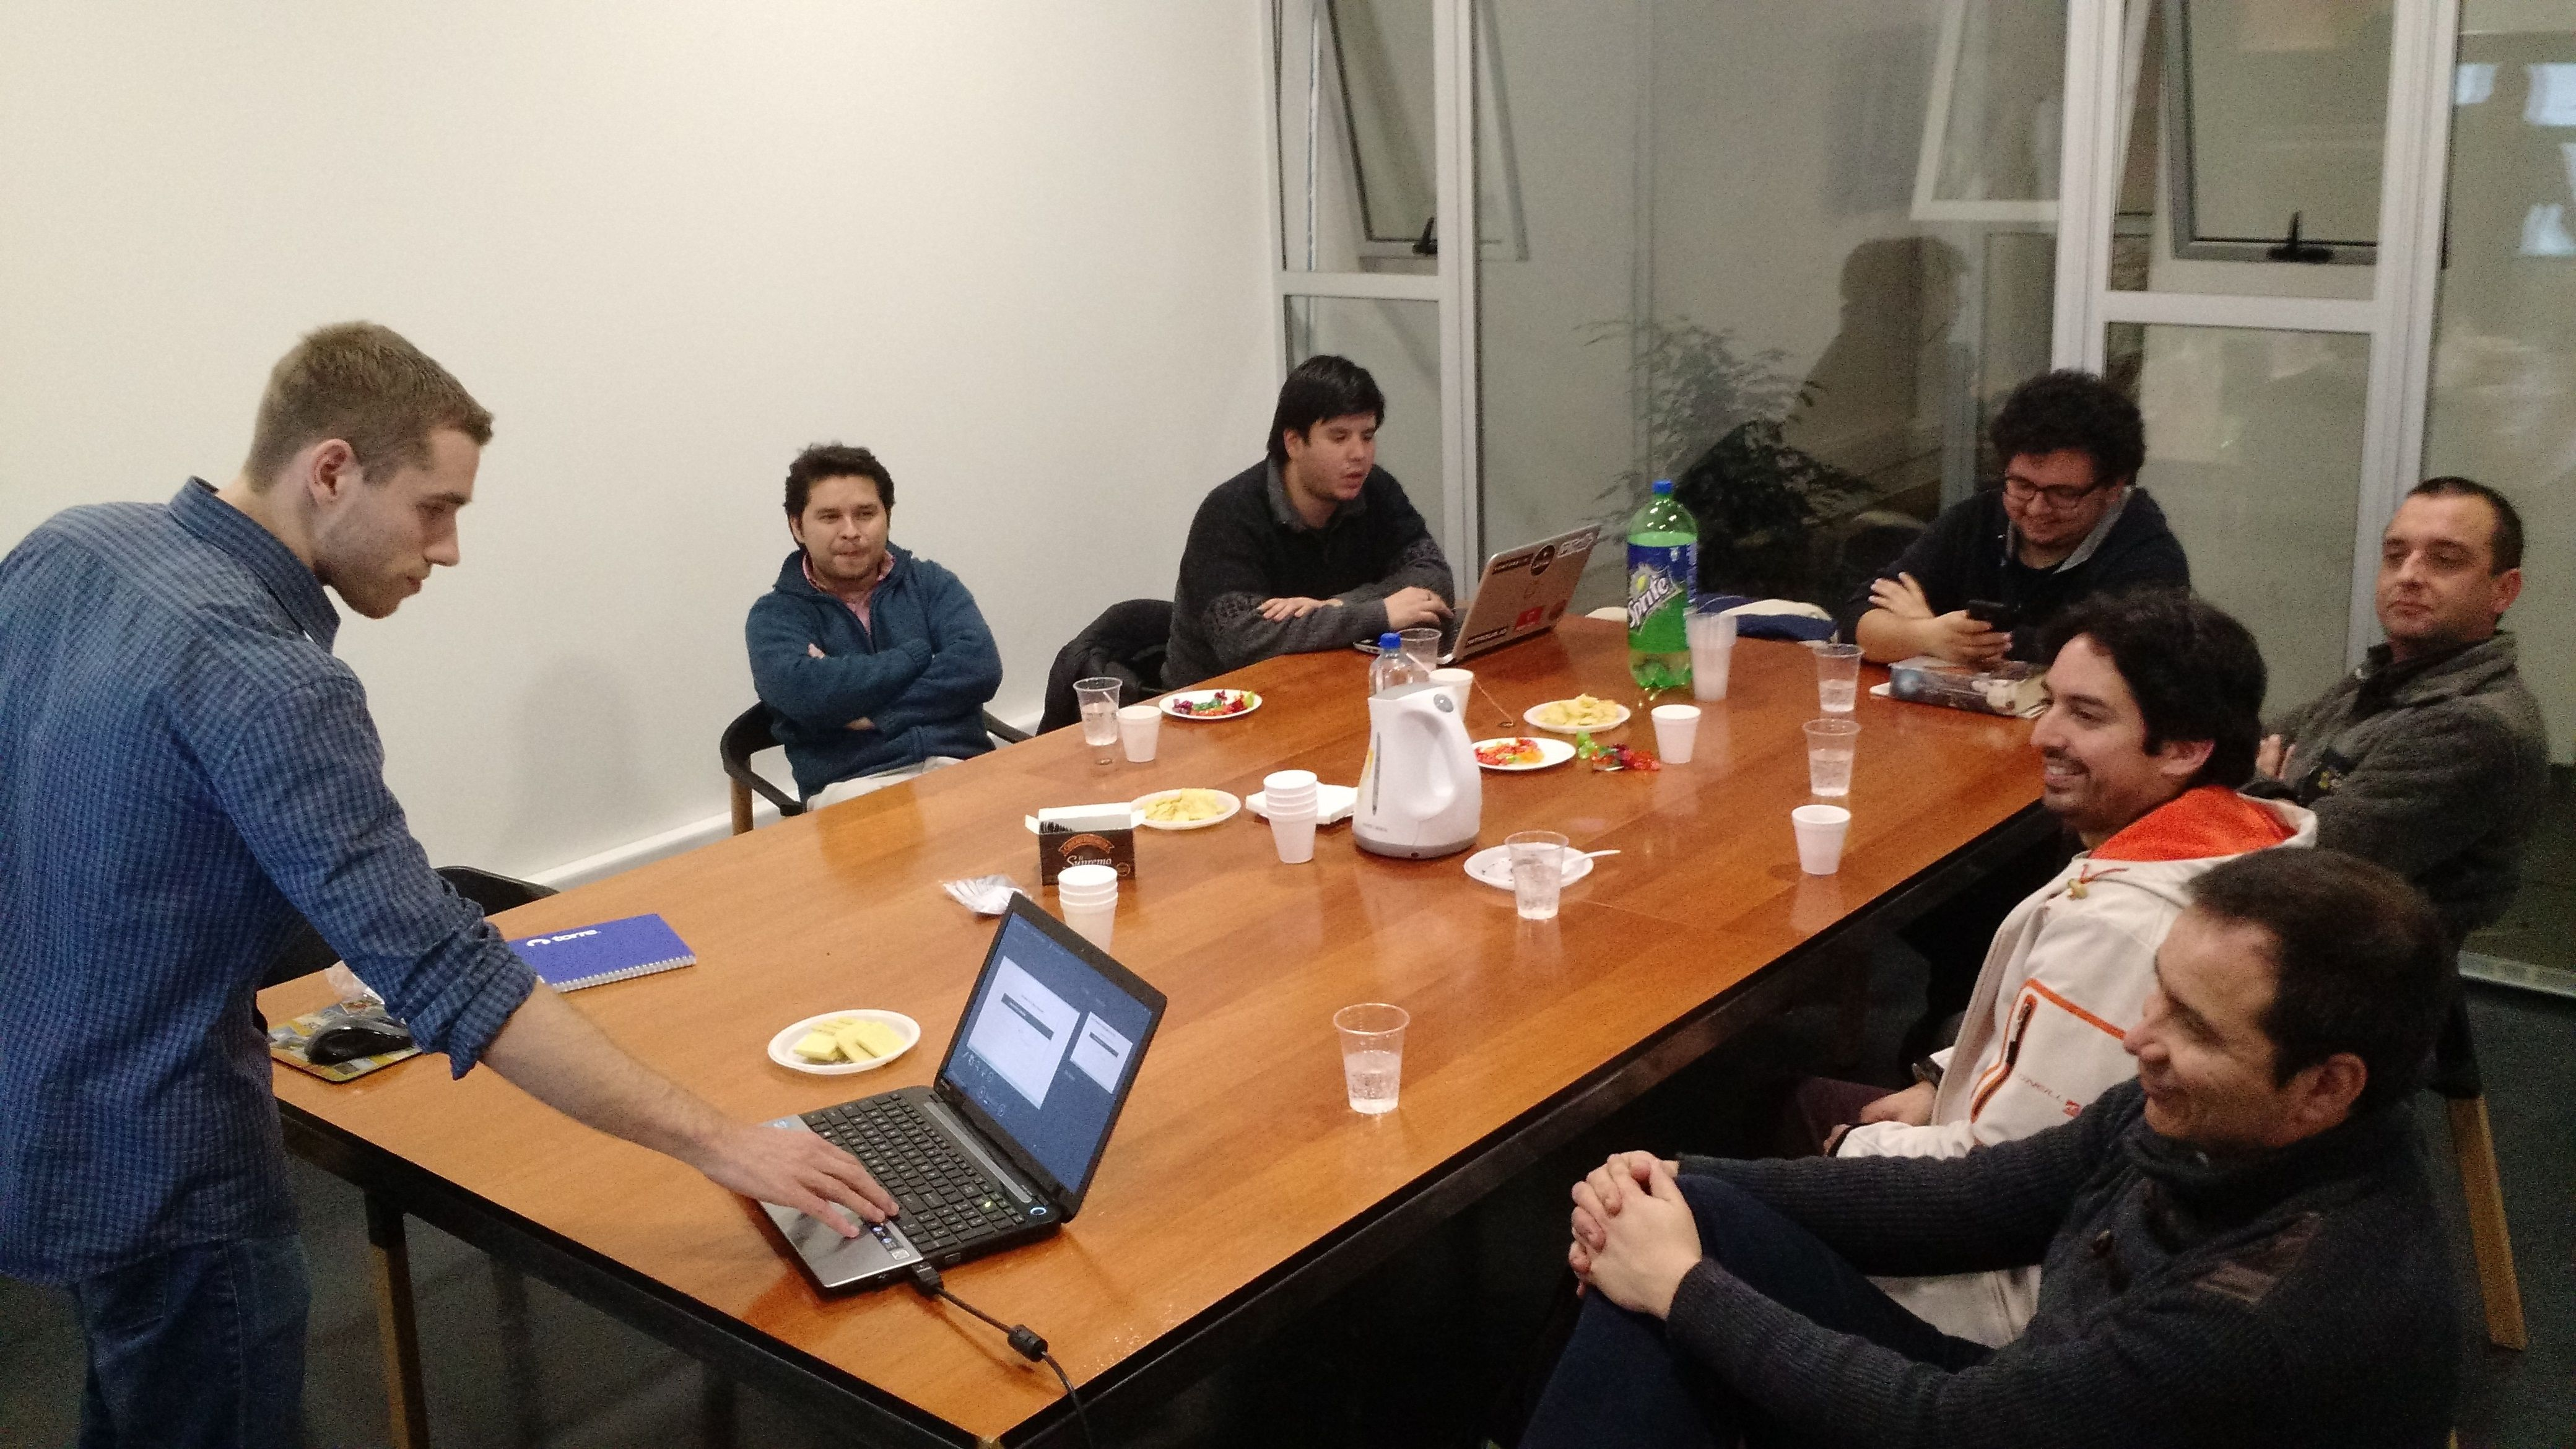 Santiago WordPress Meetup